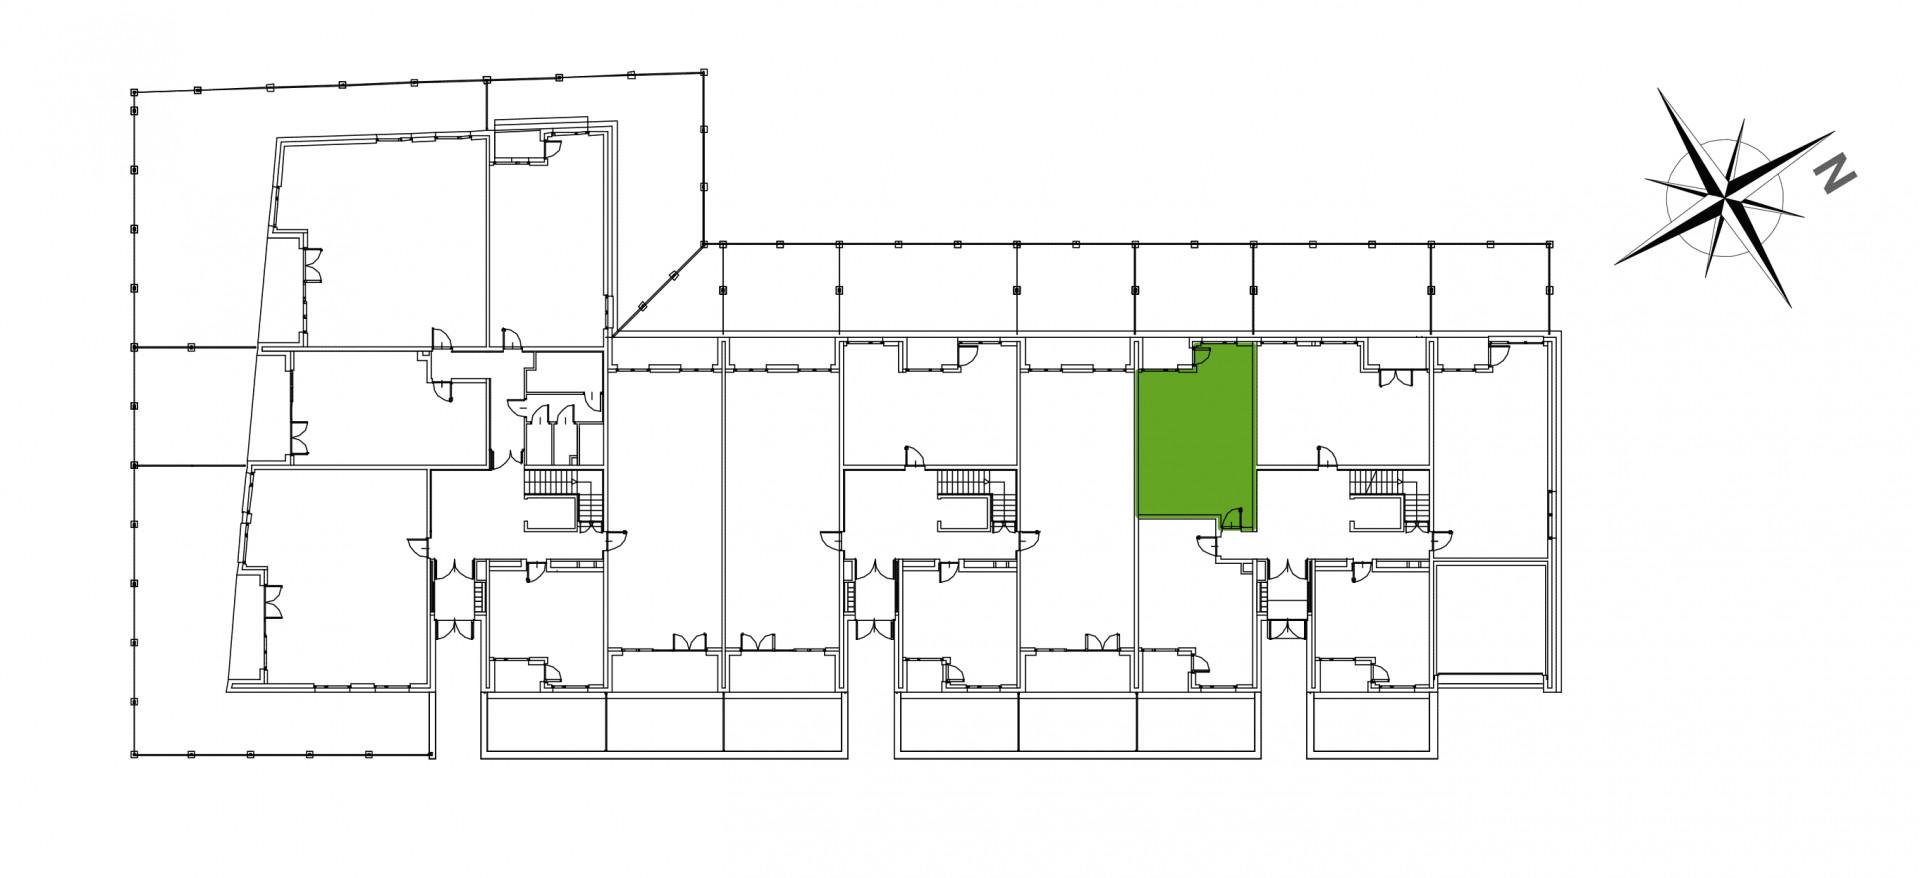 Mazowiecka 72 / apartament nr 2 rzut 2